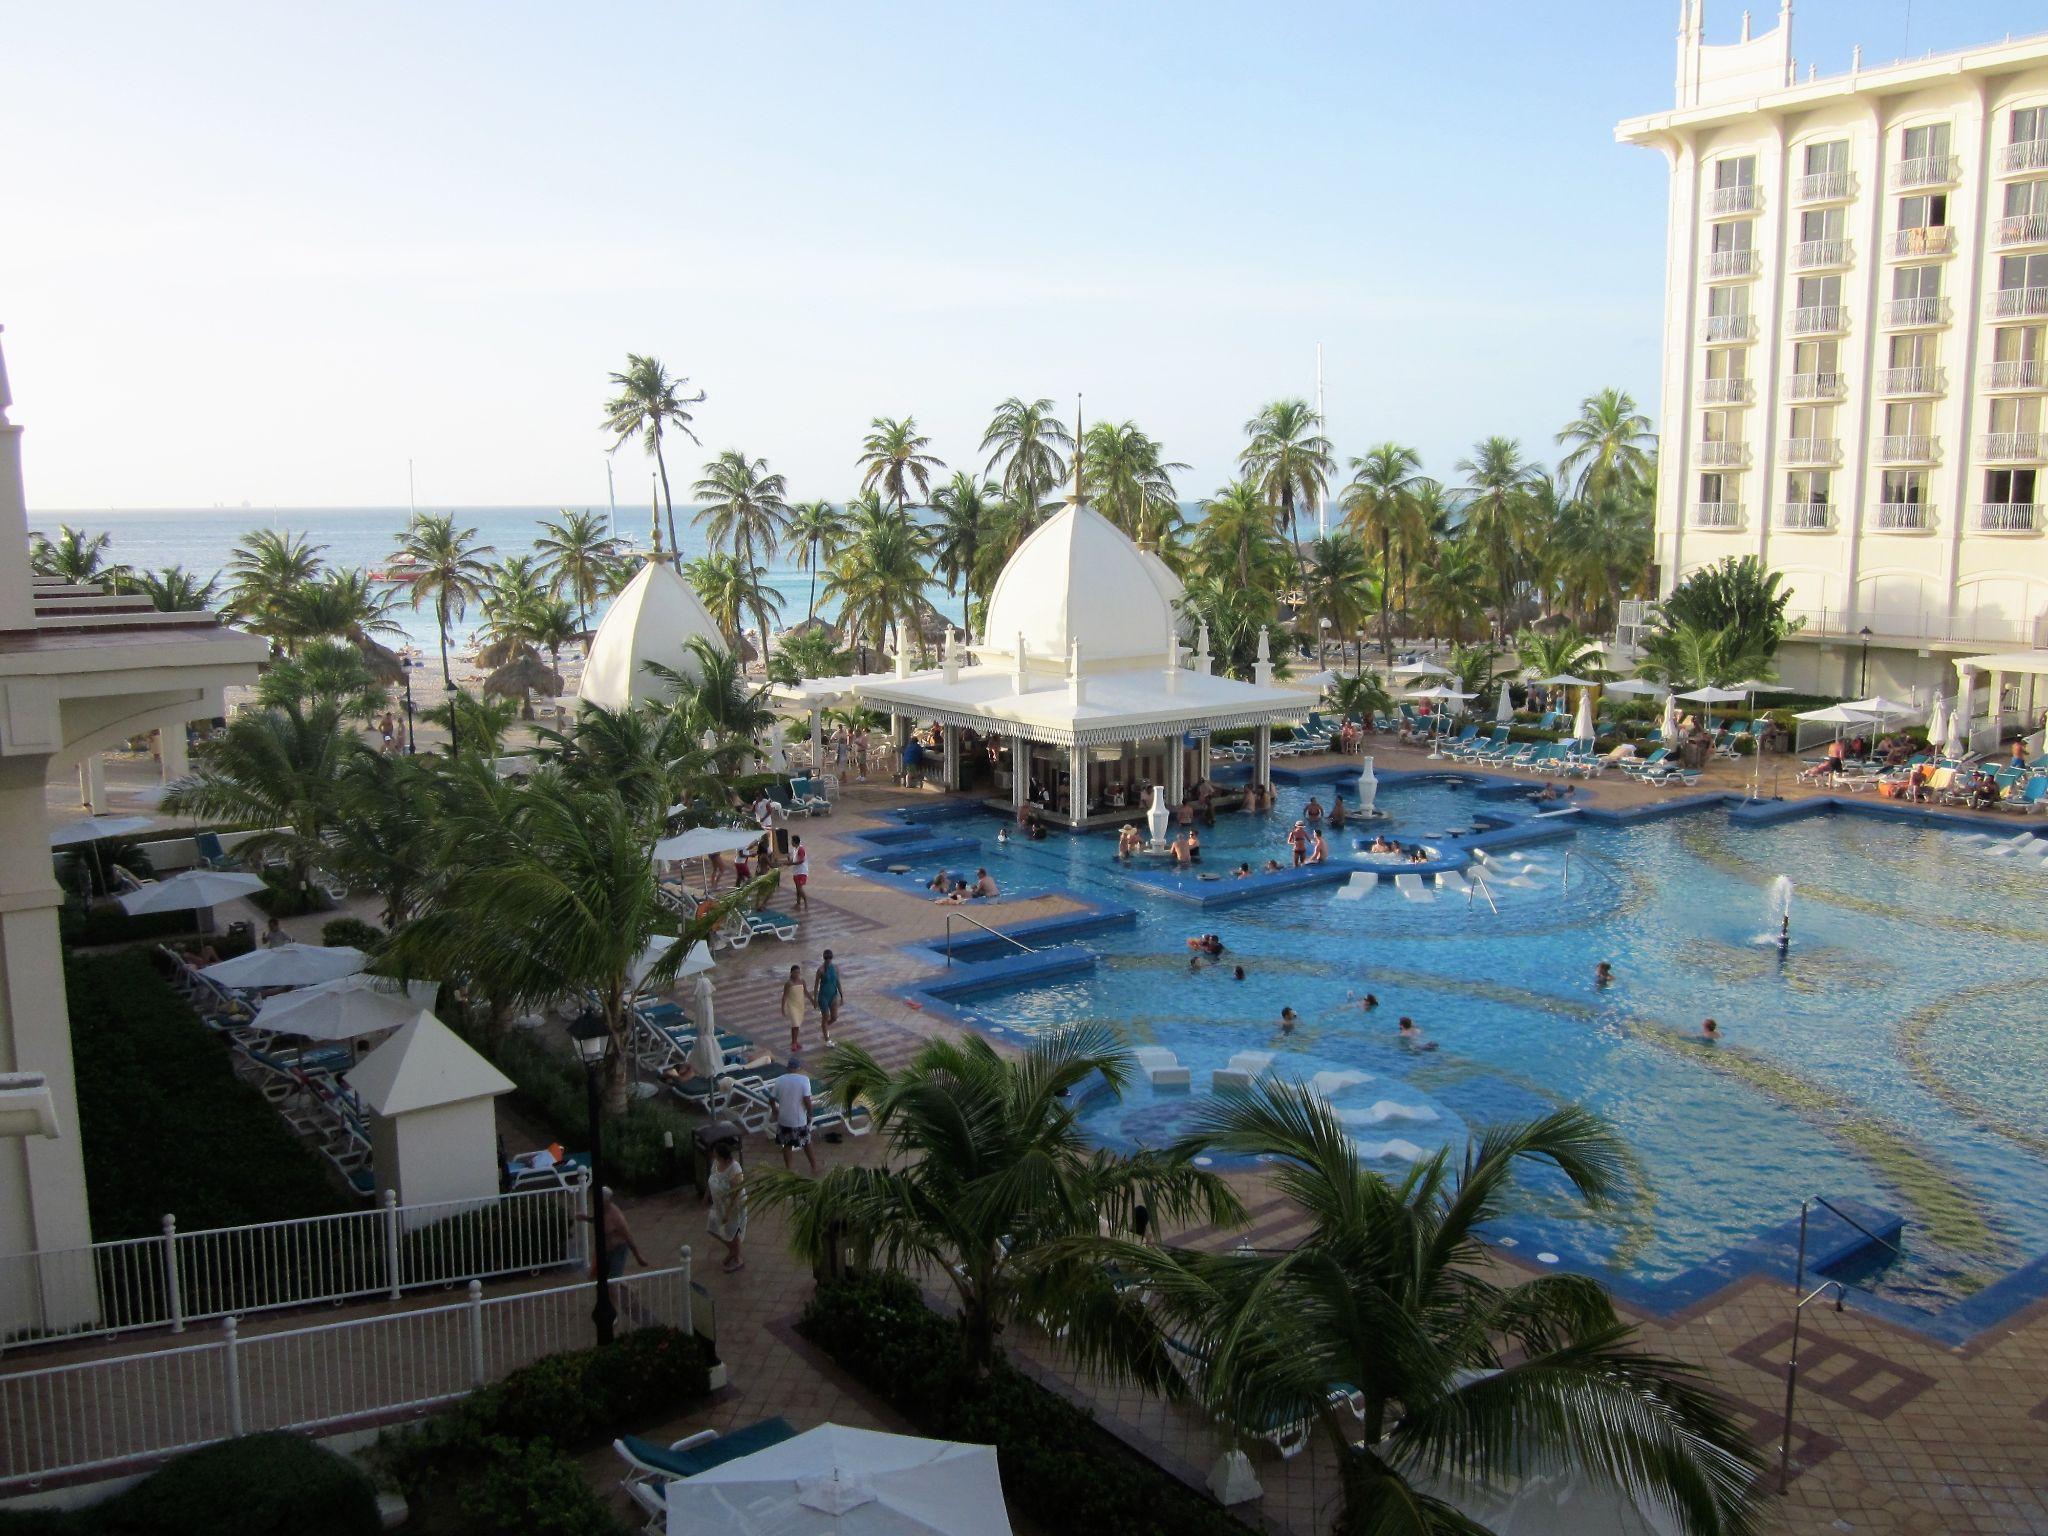 Upscale hotel pool